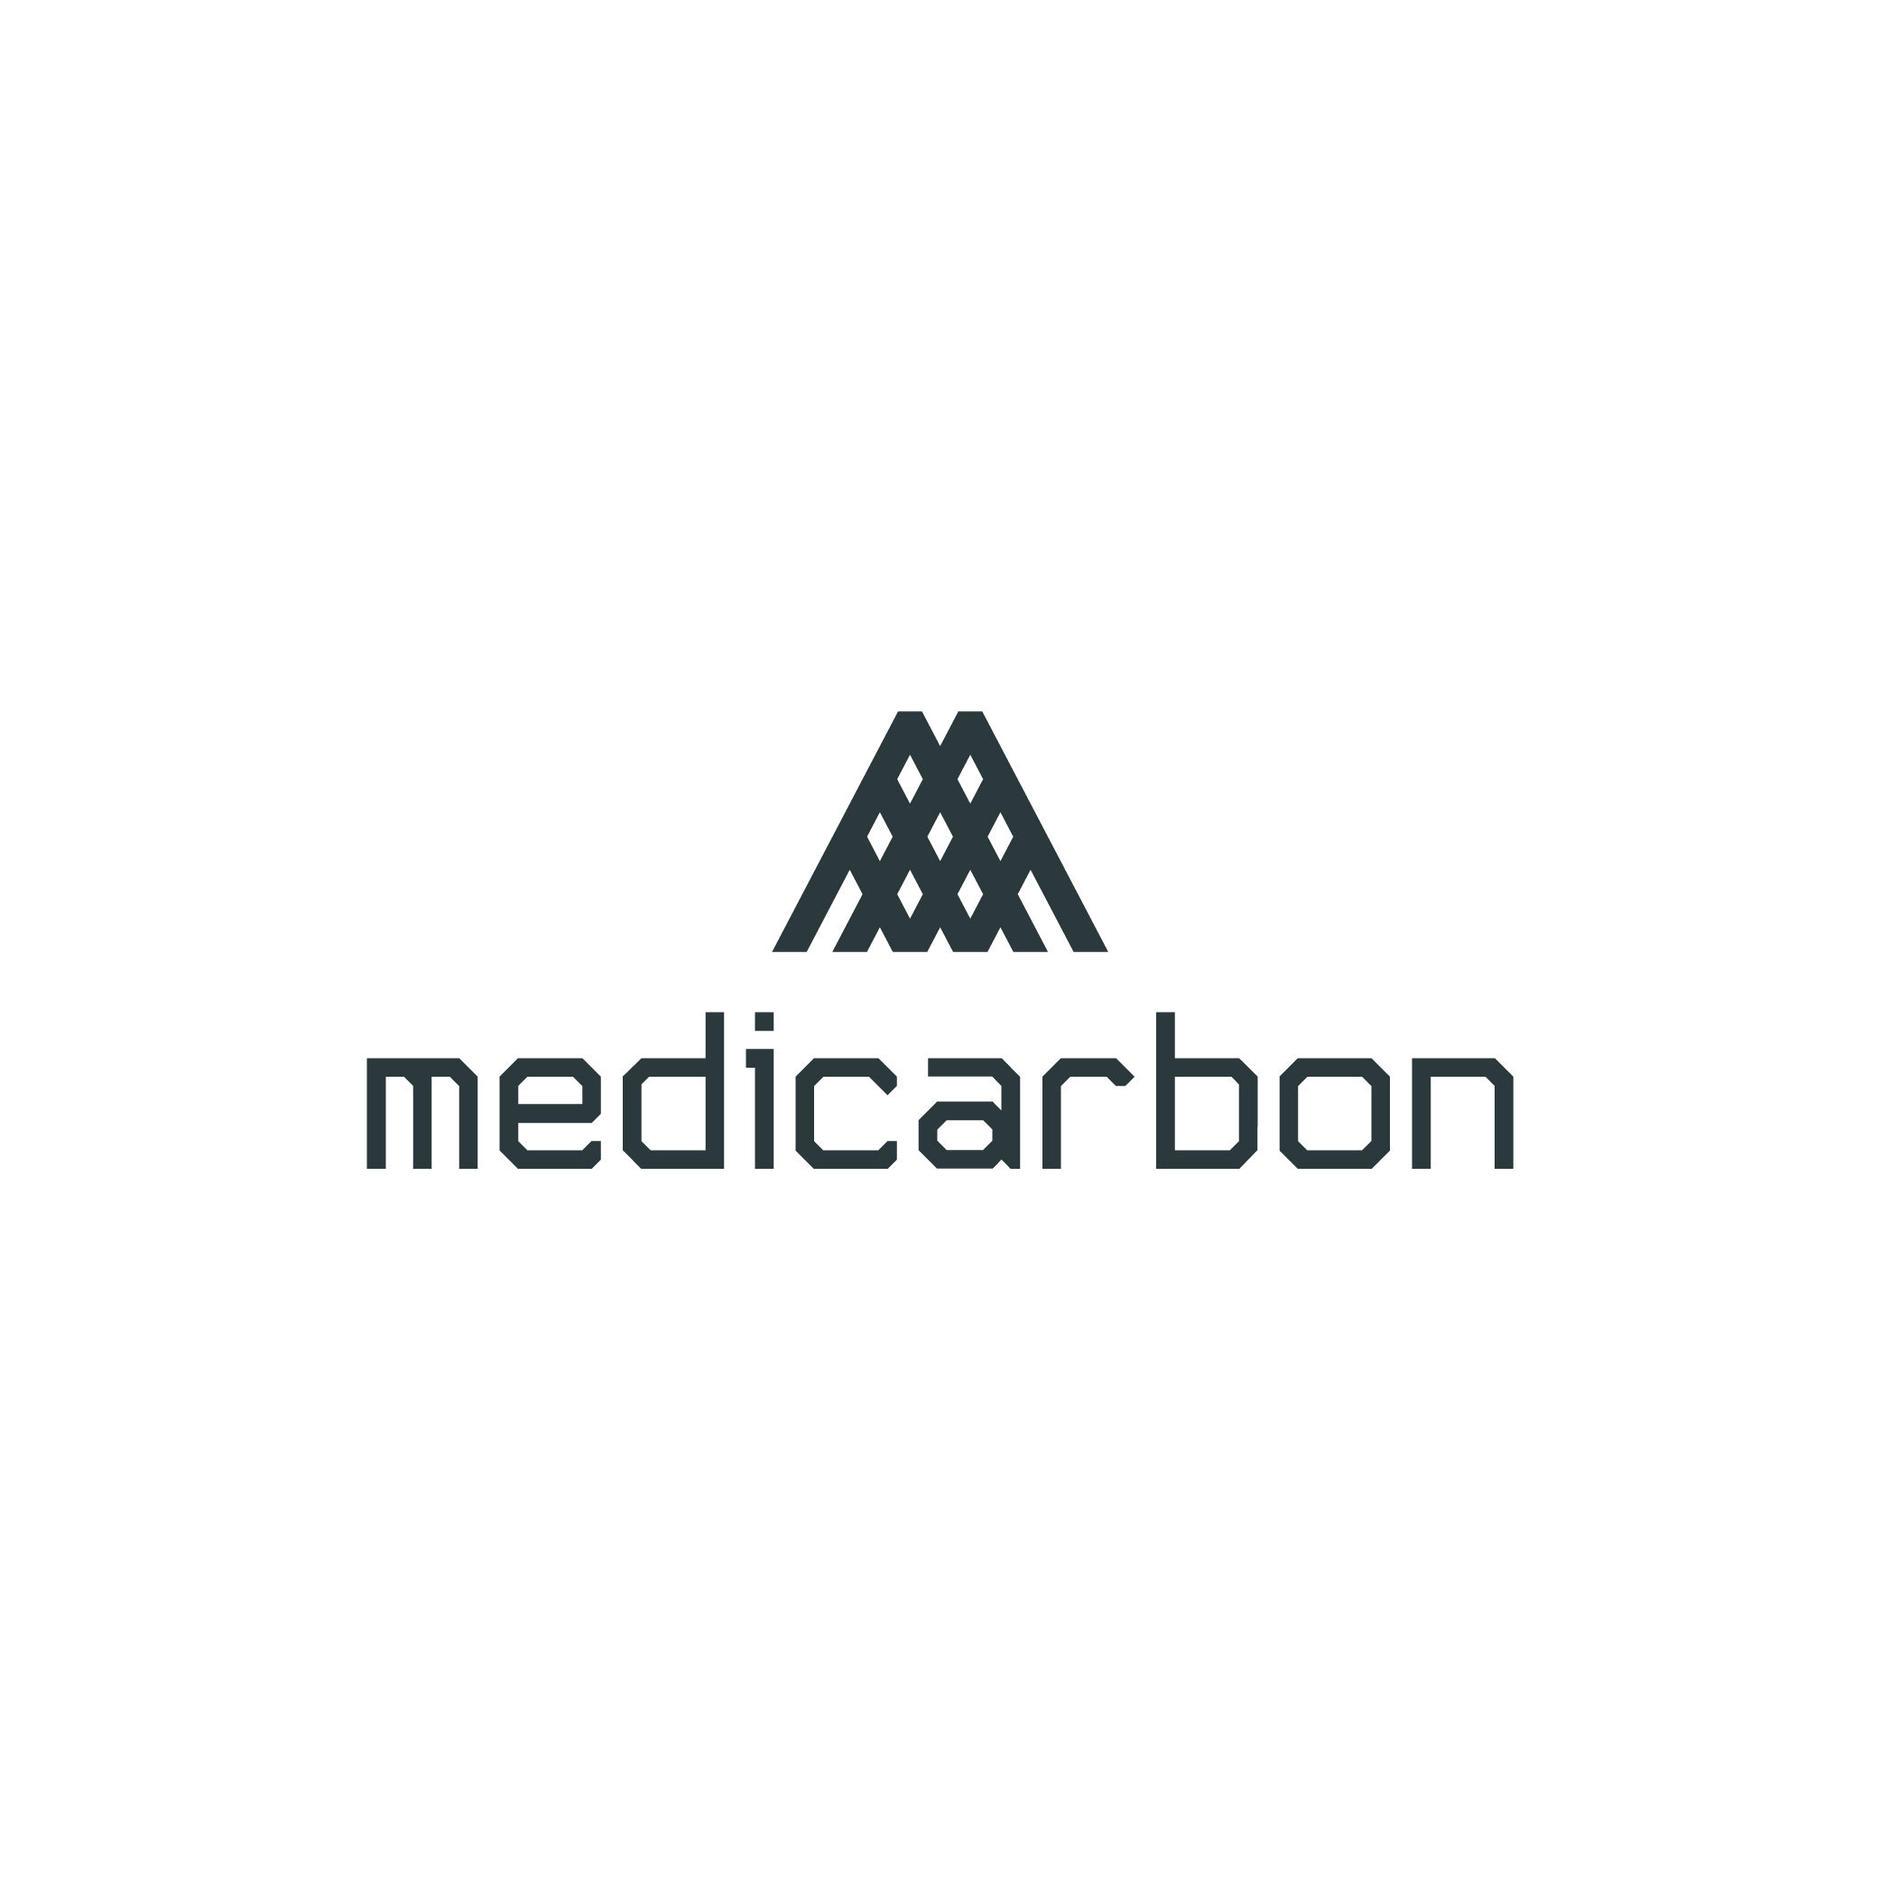 medicarbon store